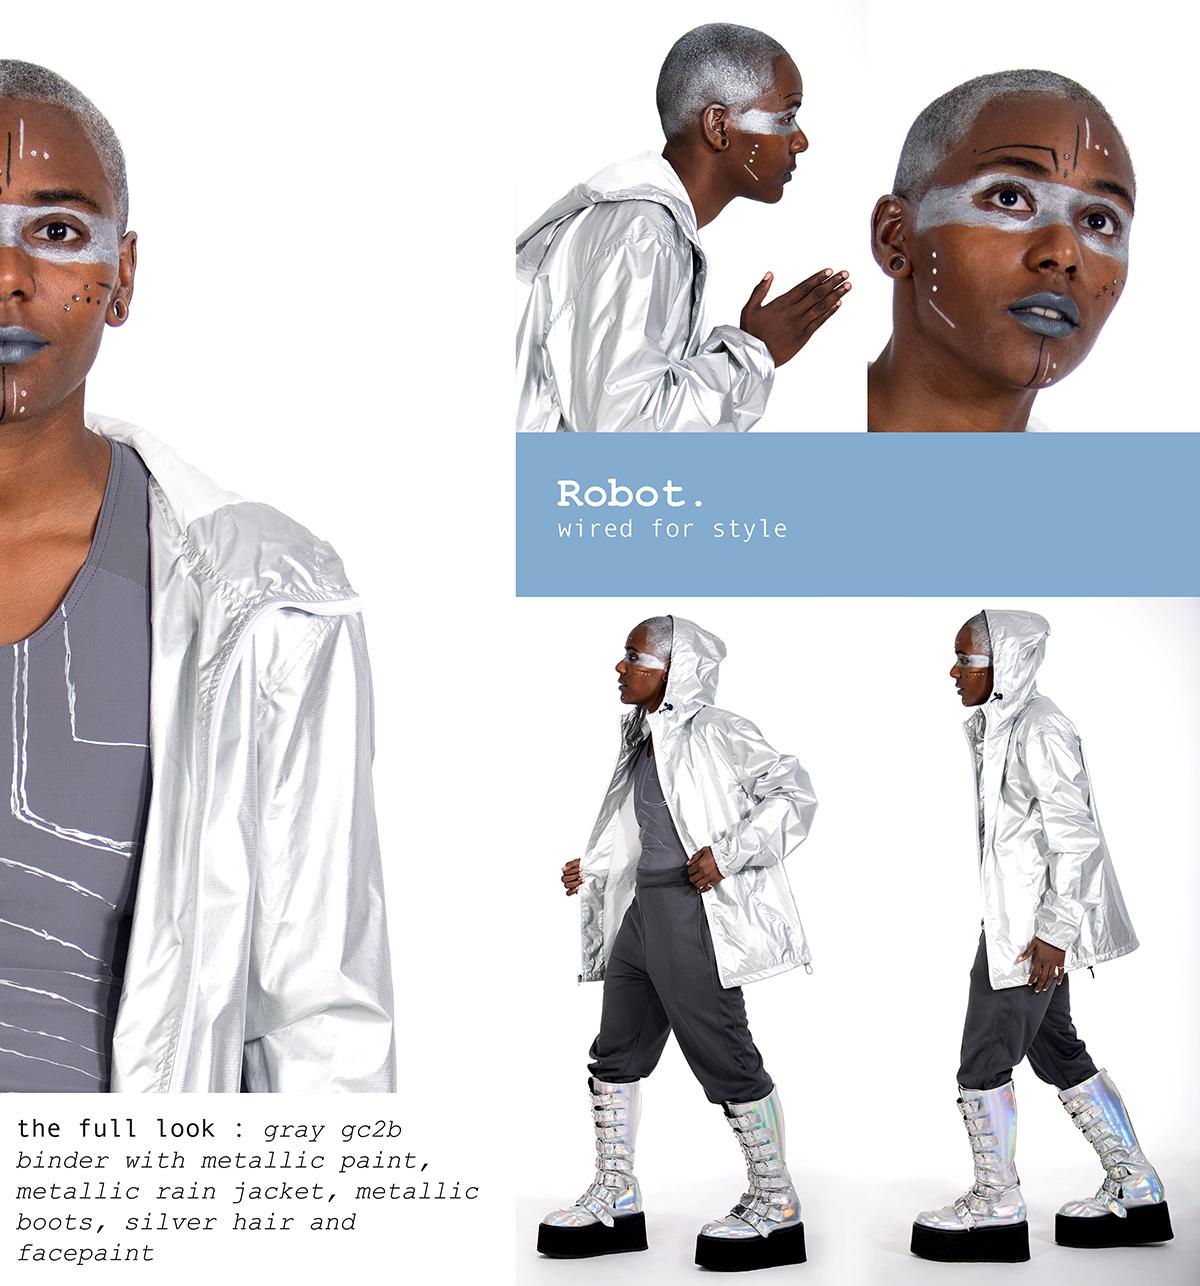 Robot. wired for style. the full look: 1 / Gray gc2b Binder with Metallic Paint 2 / Metallic Rain Jacket 3 / Metallic Boots 4 / Silver Hairspray 5 / Facepaint